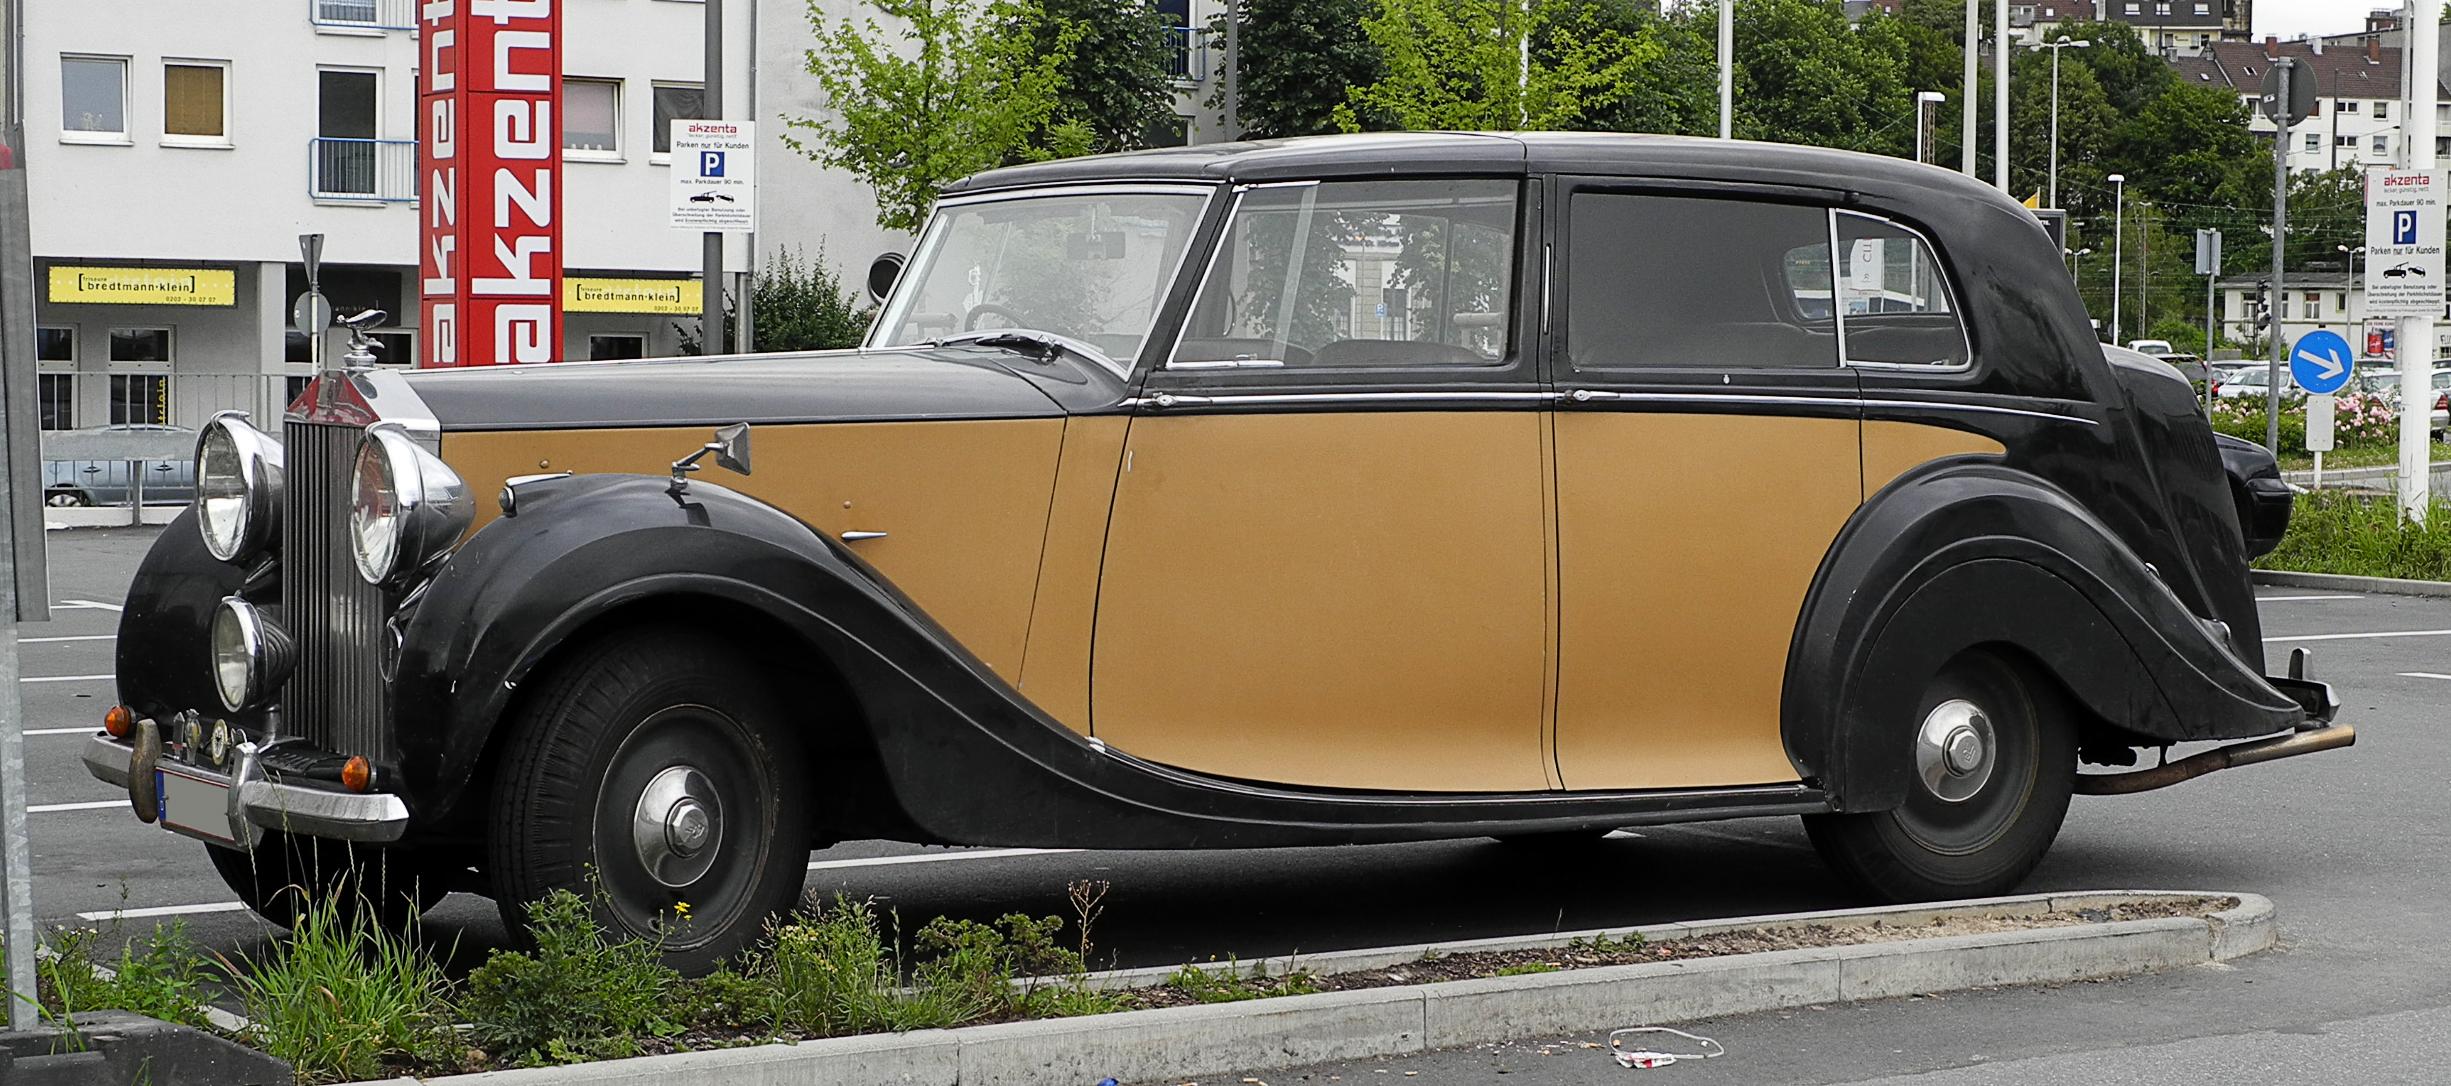 Rolls Royce Wraith Wikipedia Rolls-royce Silver Wraith